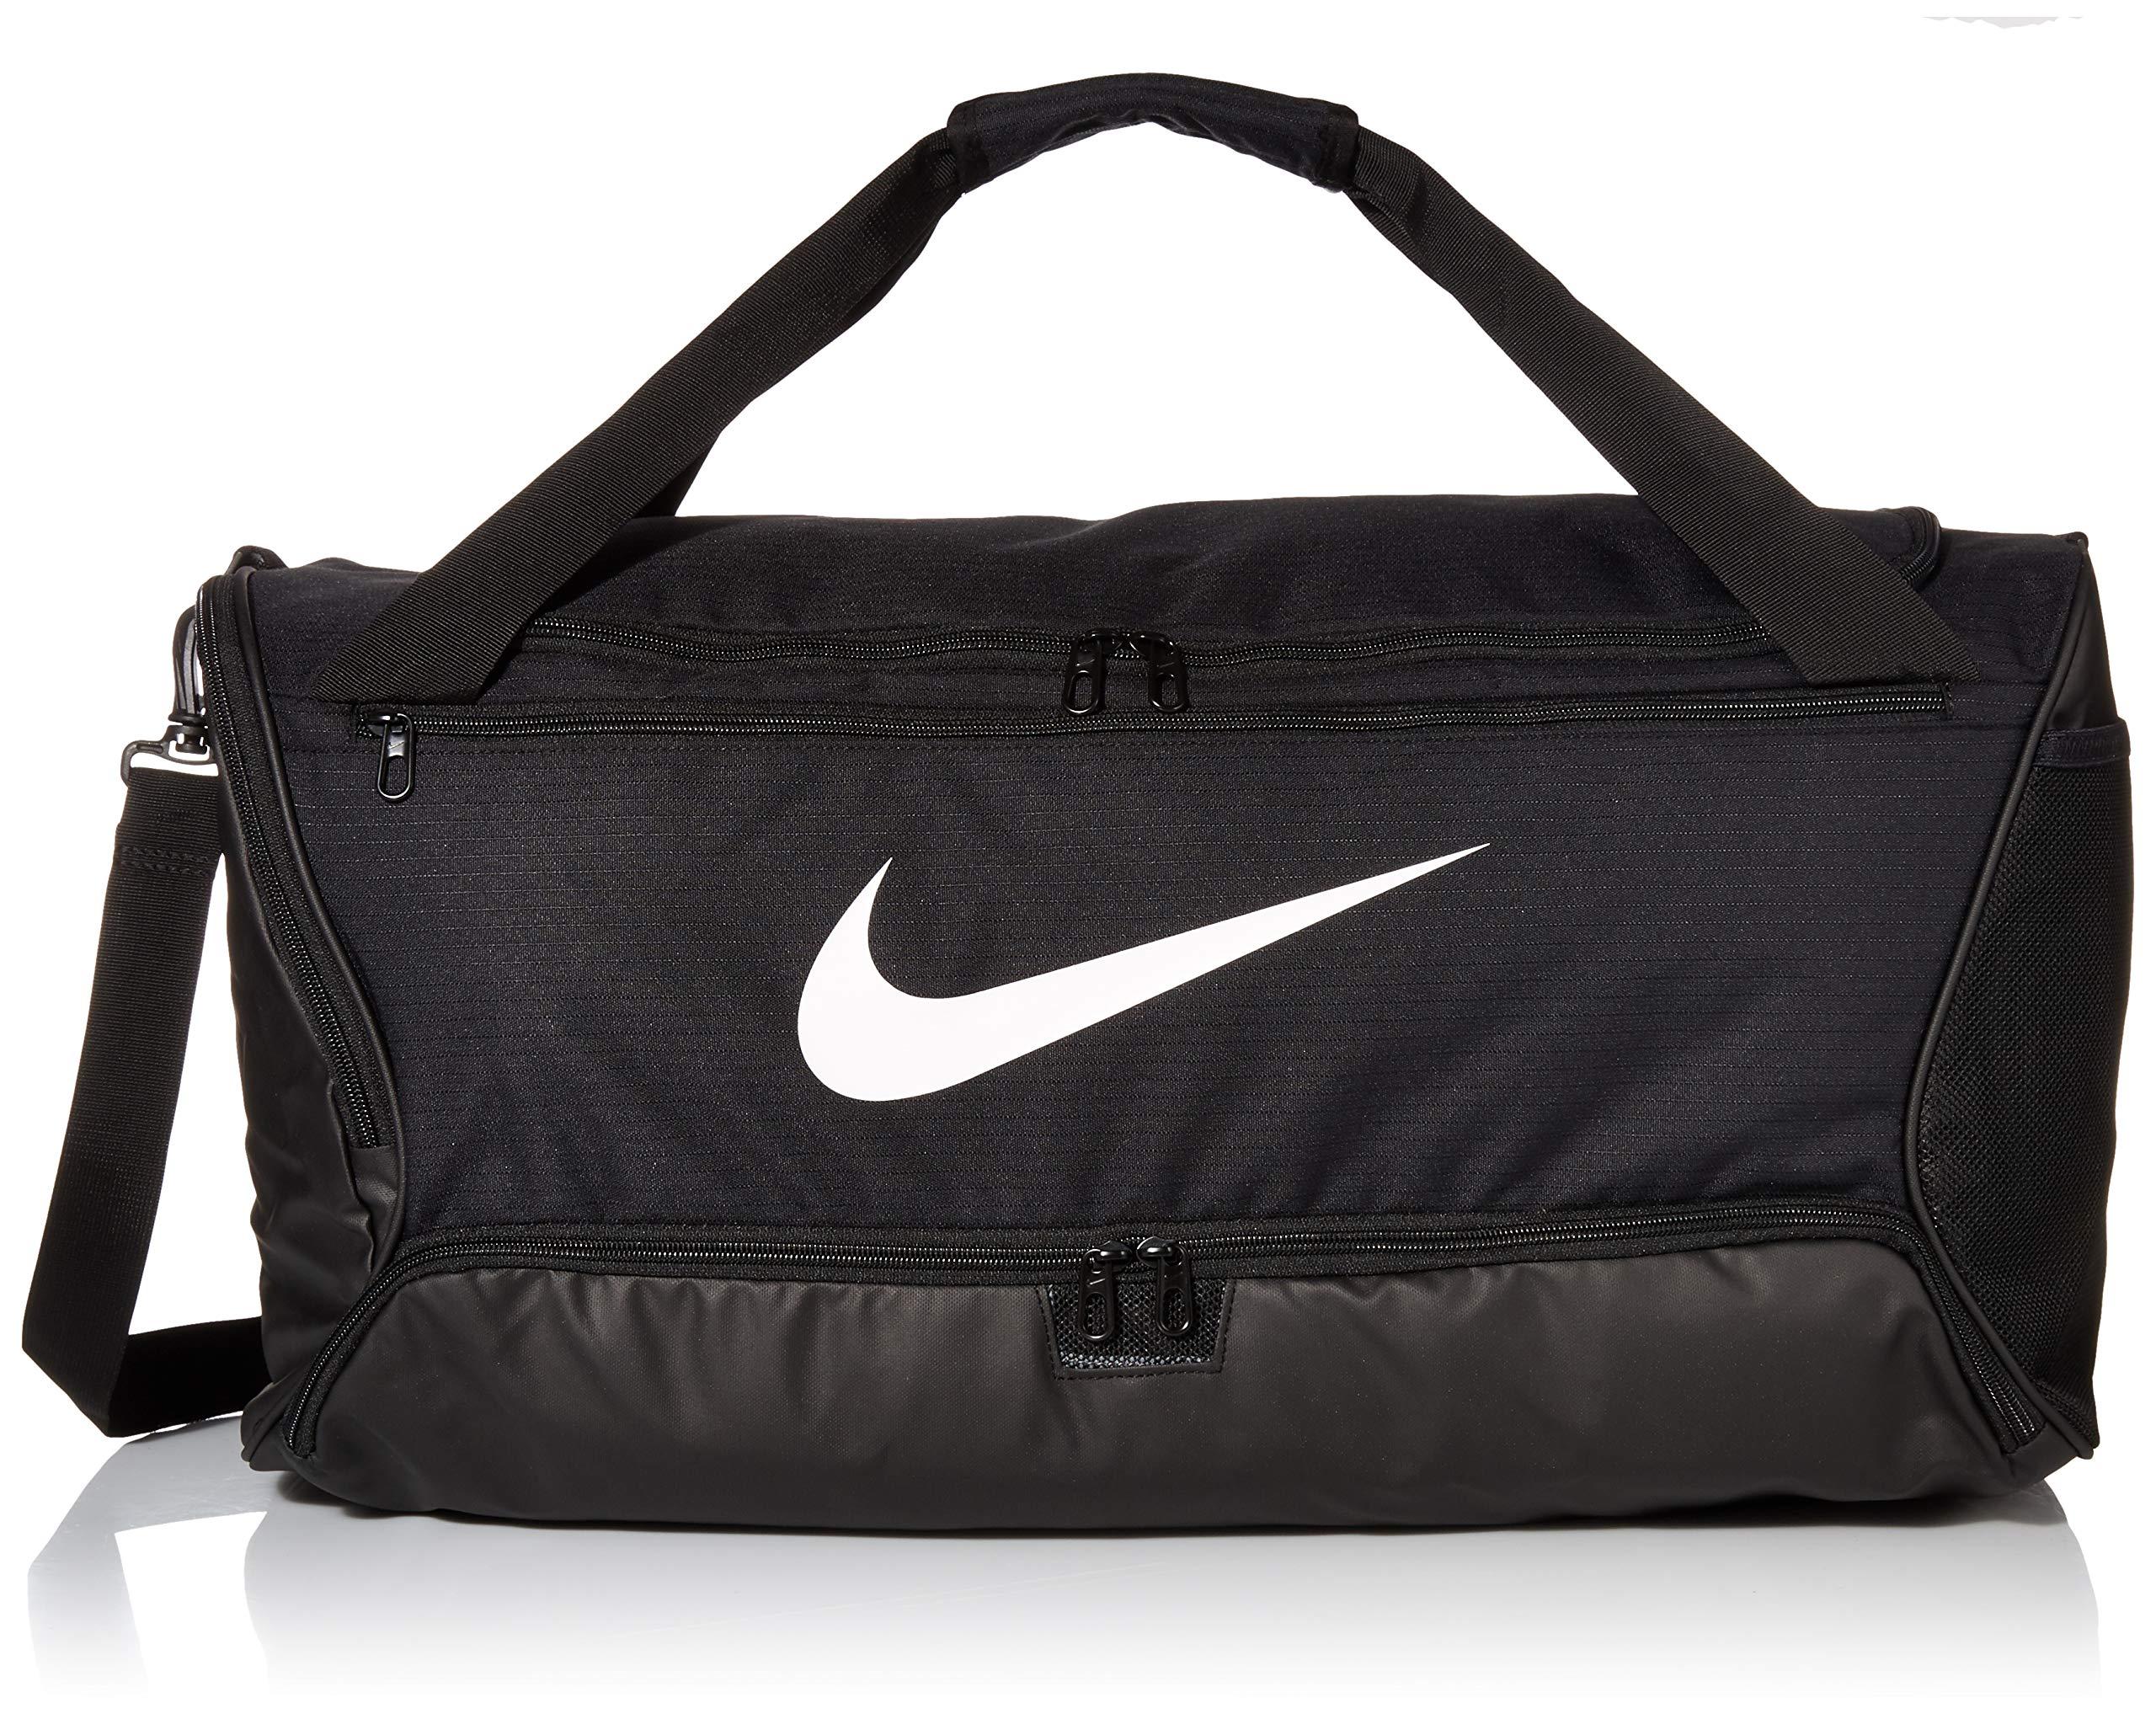 Nike Brasilia Training Medium Duffle Bag, Durable Nike Duffle Bag for Women & Men with Adjustable Strap, Black/Black/White by Nike